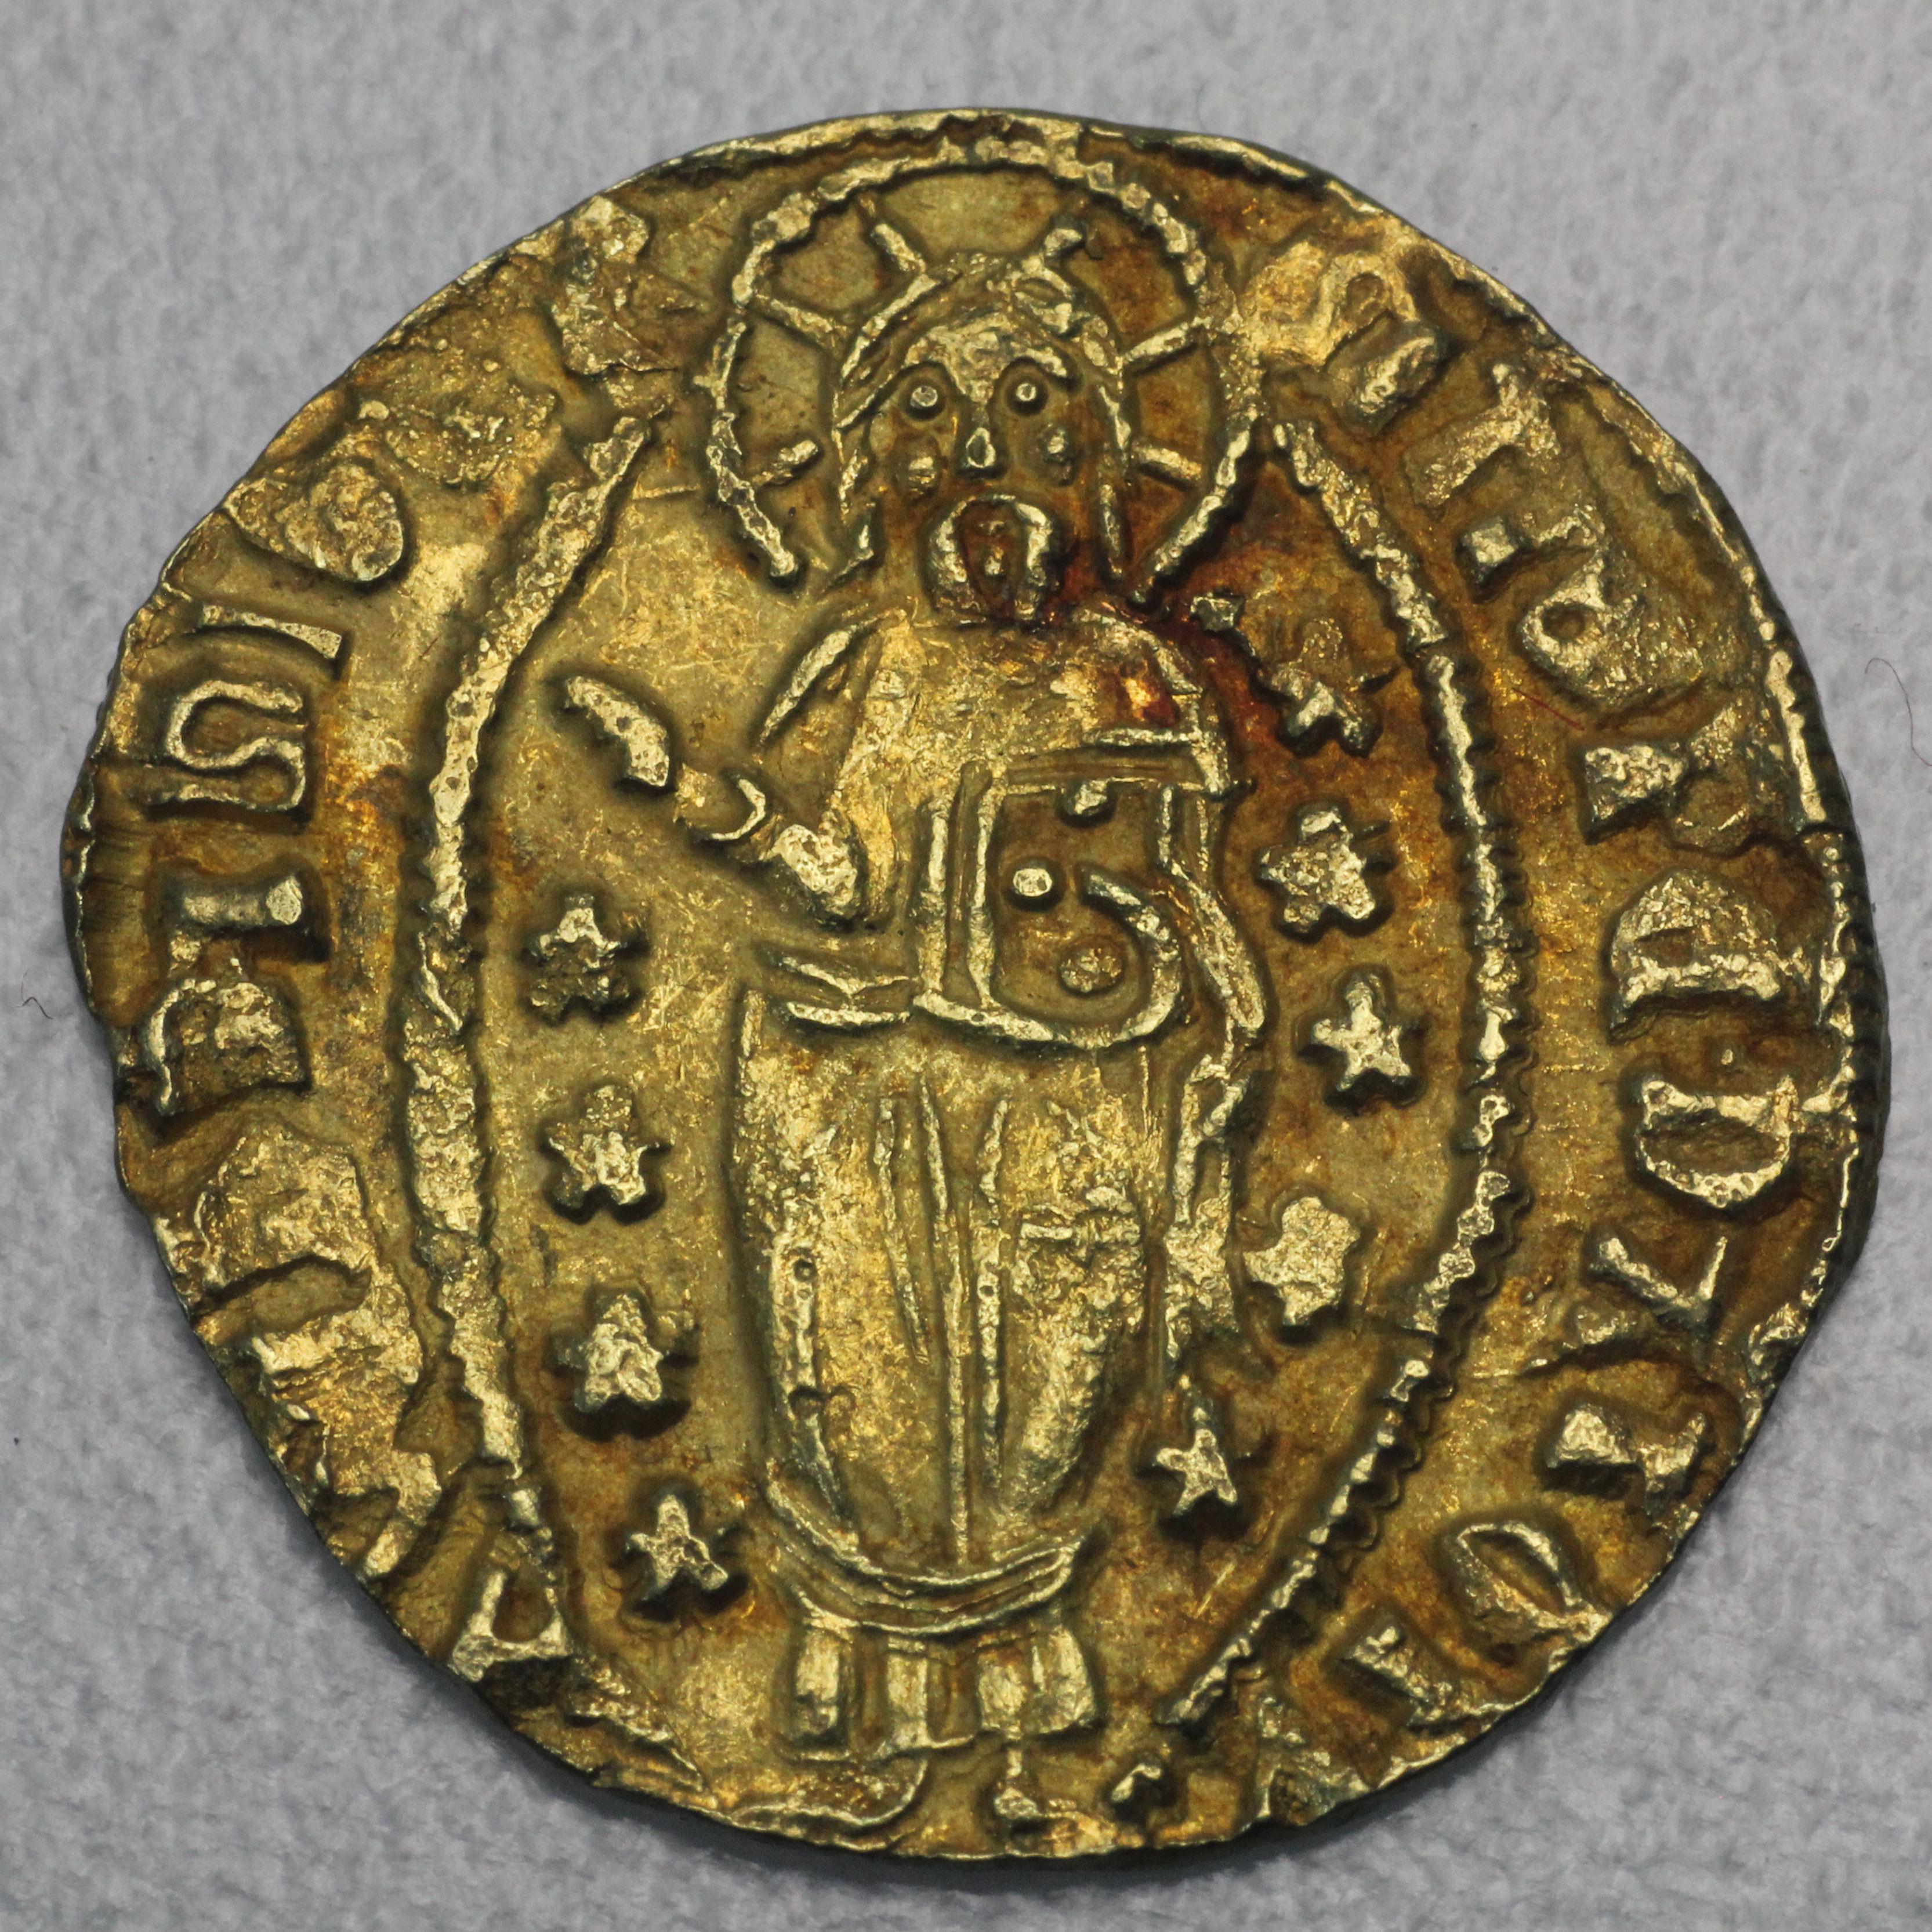 Venezianische Goldmünze